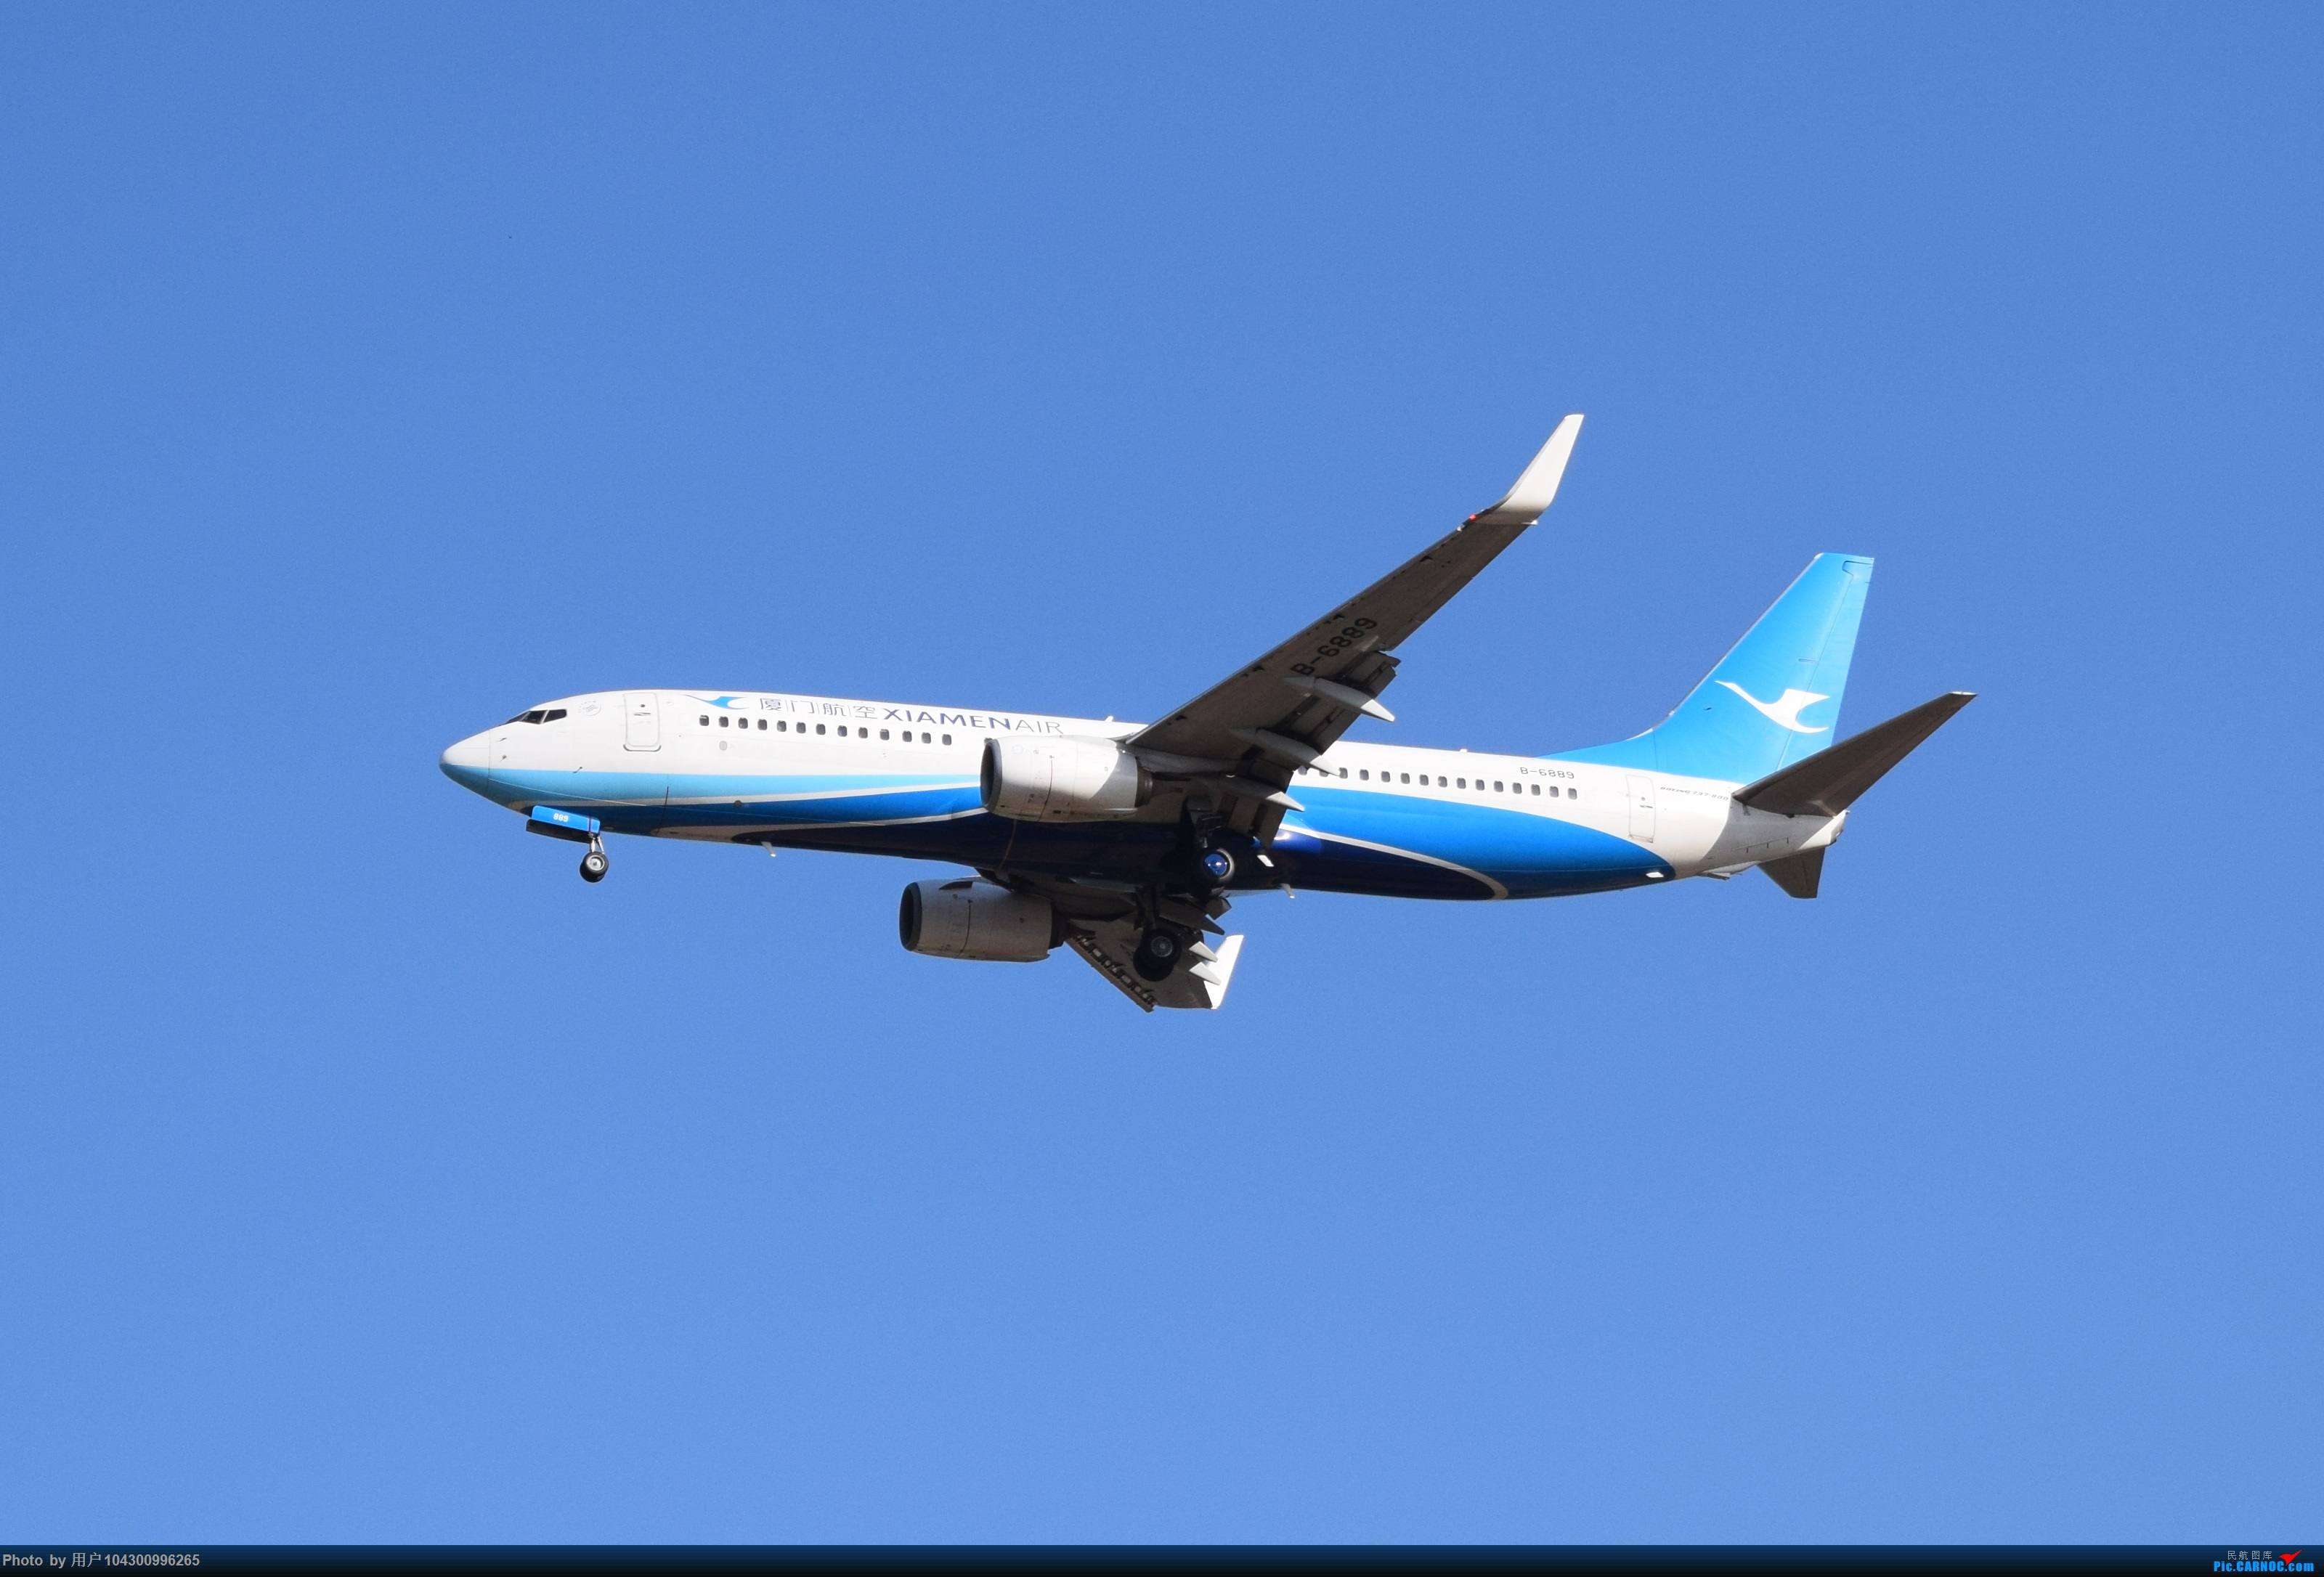 Re:[原创][KWE]贵阳今天天气不错,随便拍几张! BOEING 737-800 B-6889 中国贵阳龙洞堡国际机场